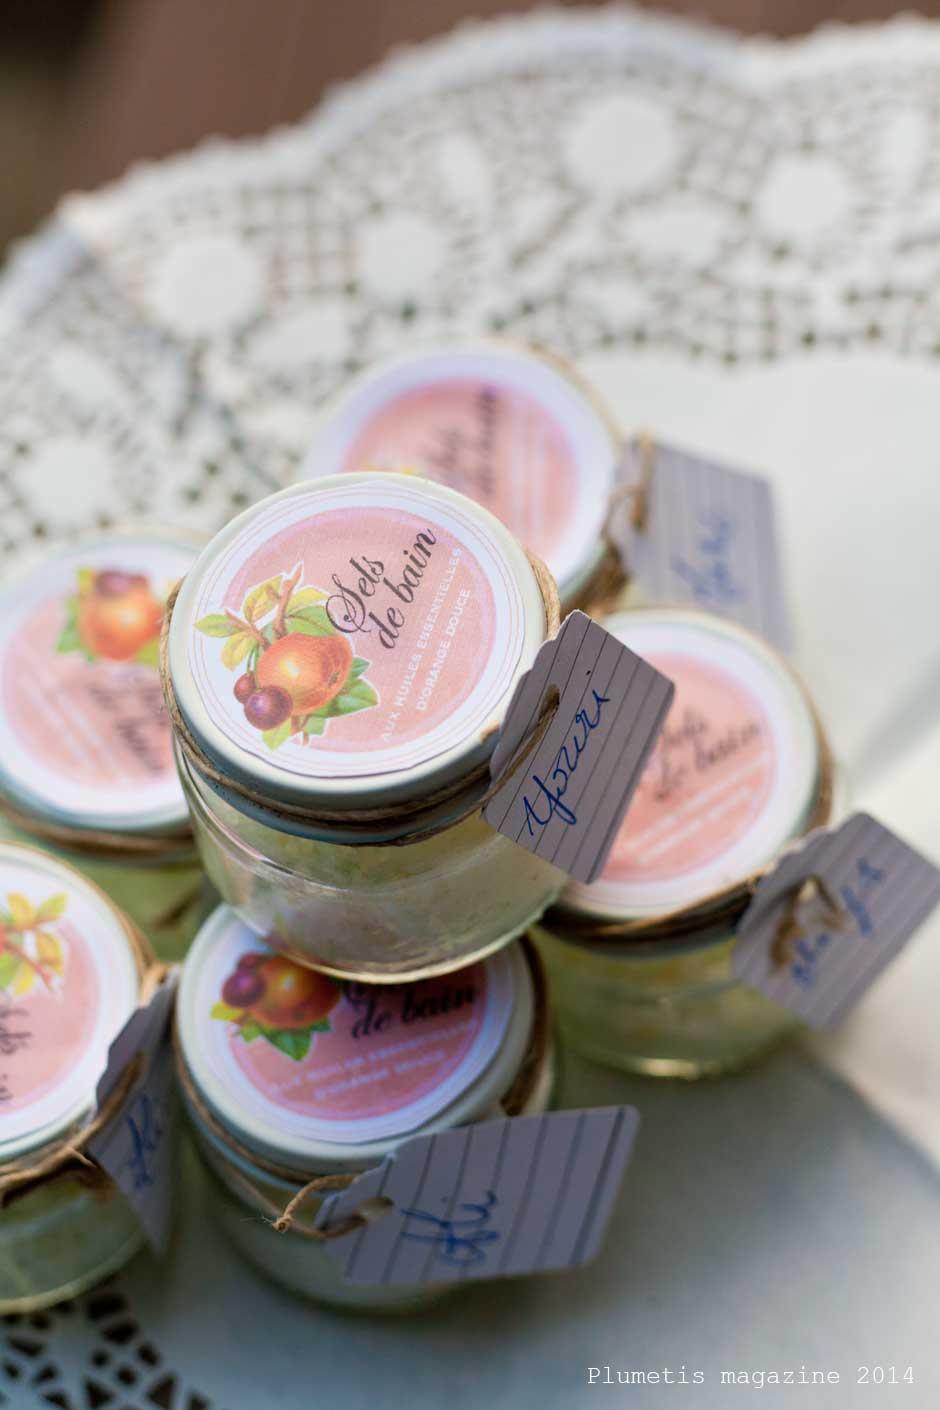 Les étiquettes de sel de bain